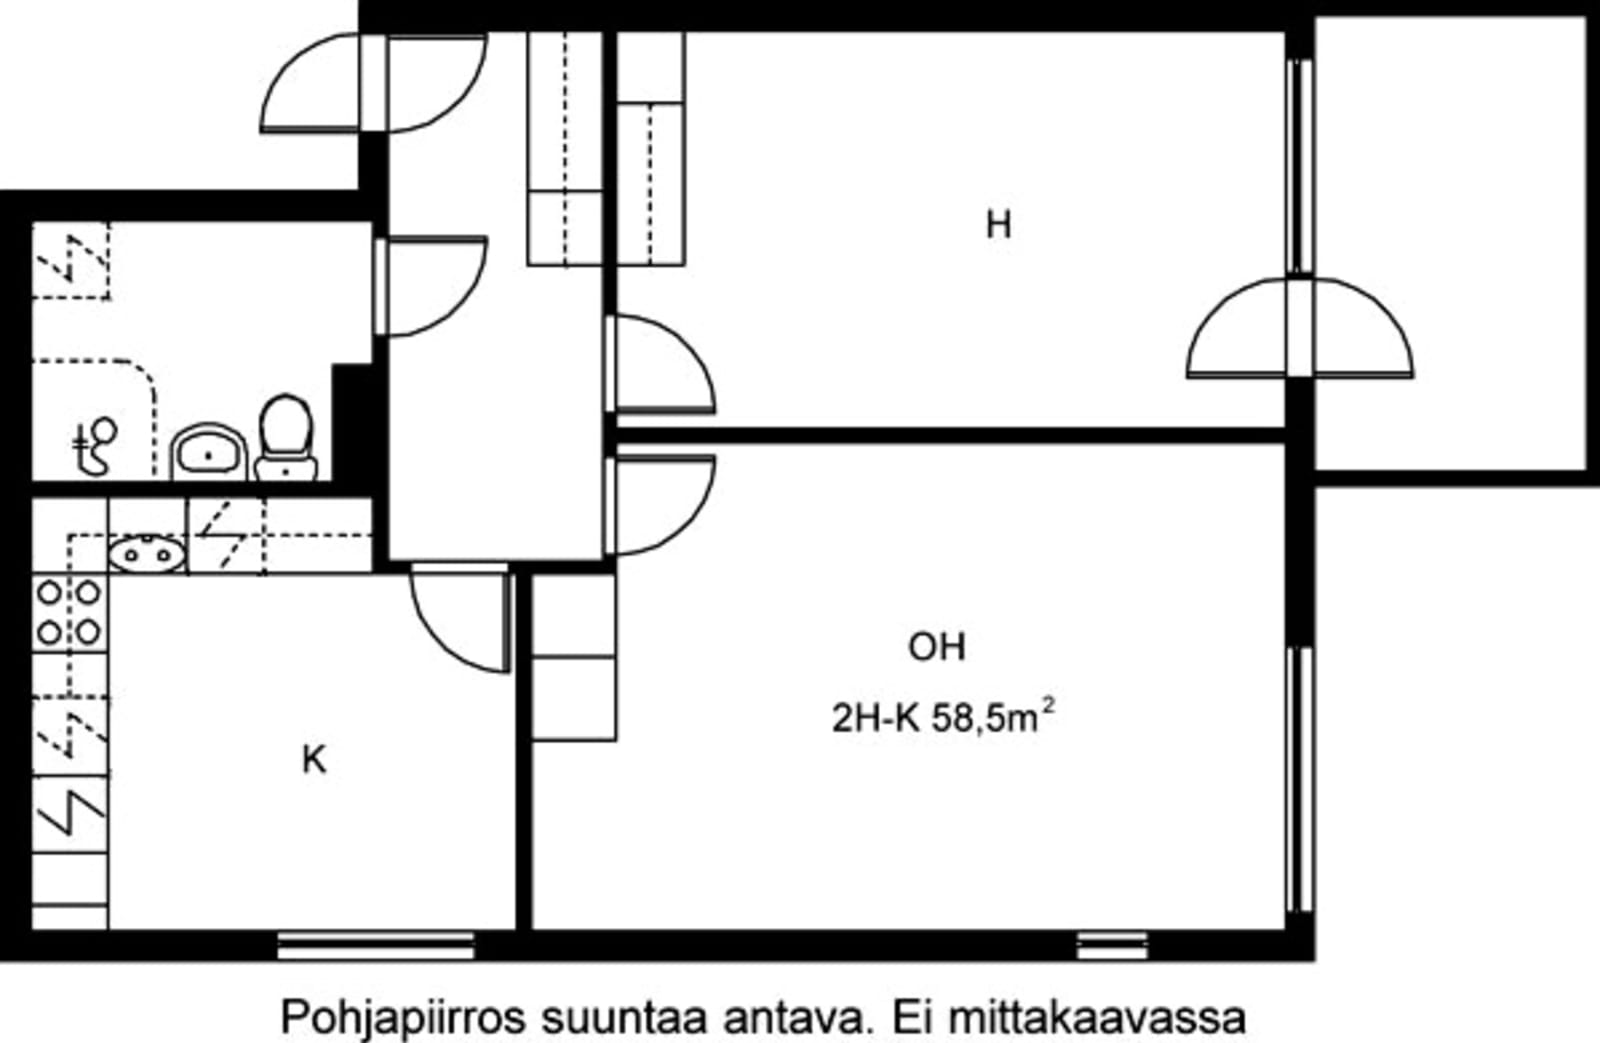 Helsinki, Vuosaari, Meri-Rastilan tie 15 H 037